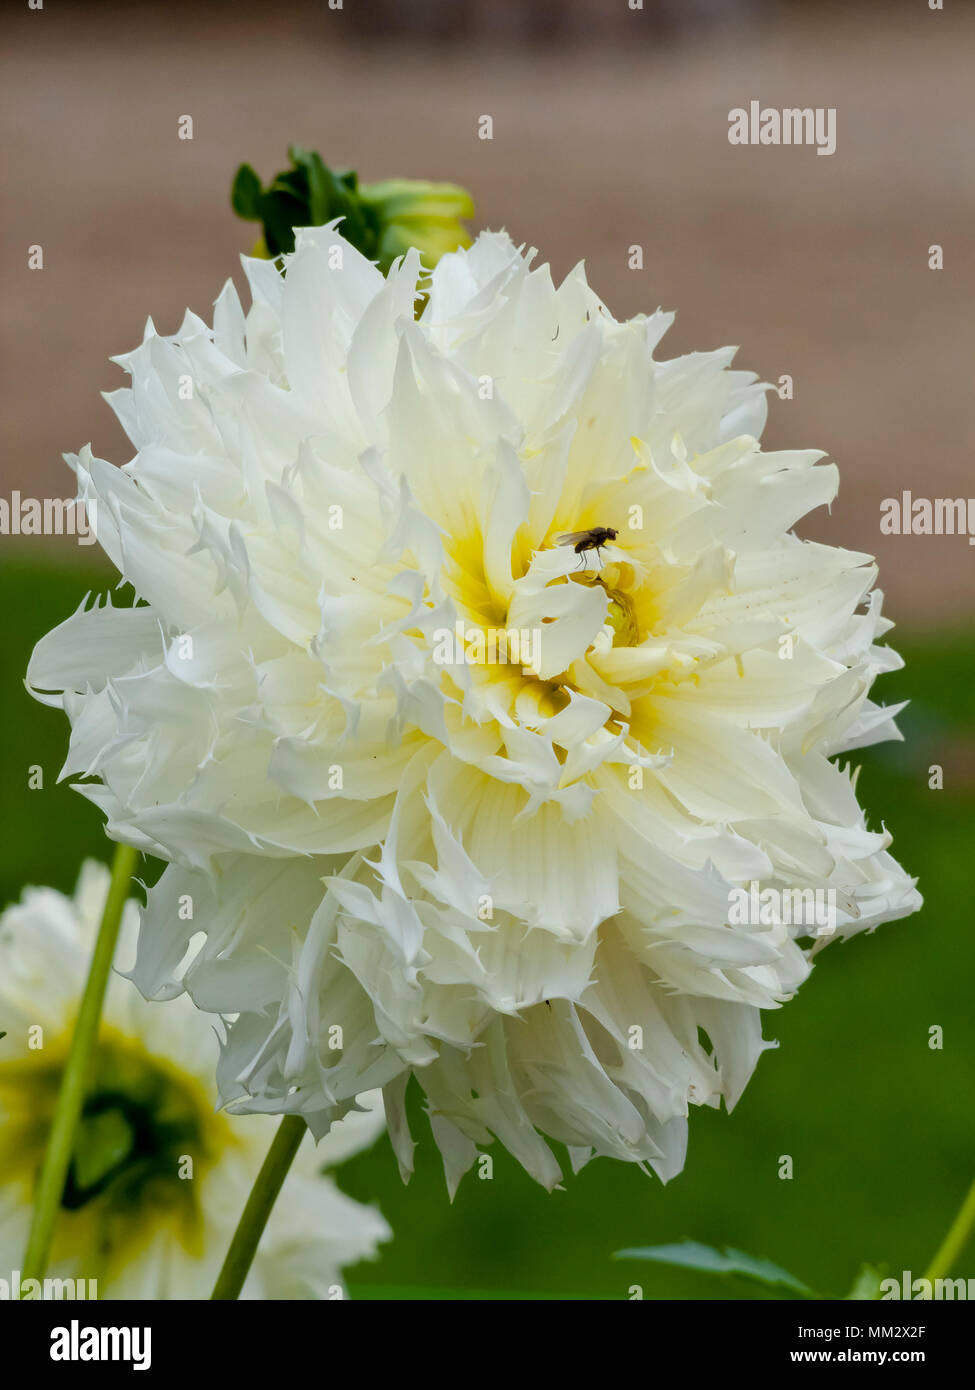 Dahlia 'Horse Feather' in bloom in a garden Stock Photo